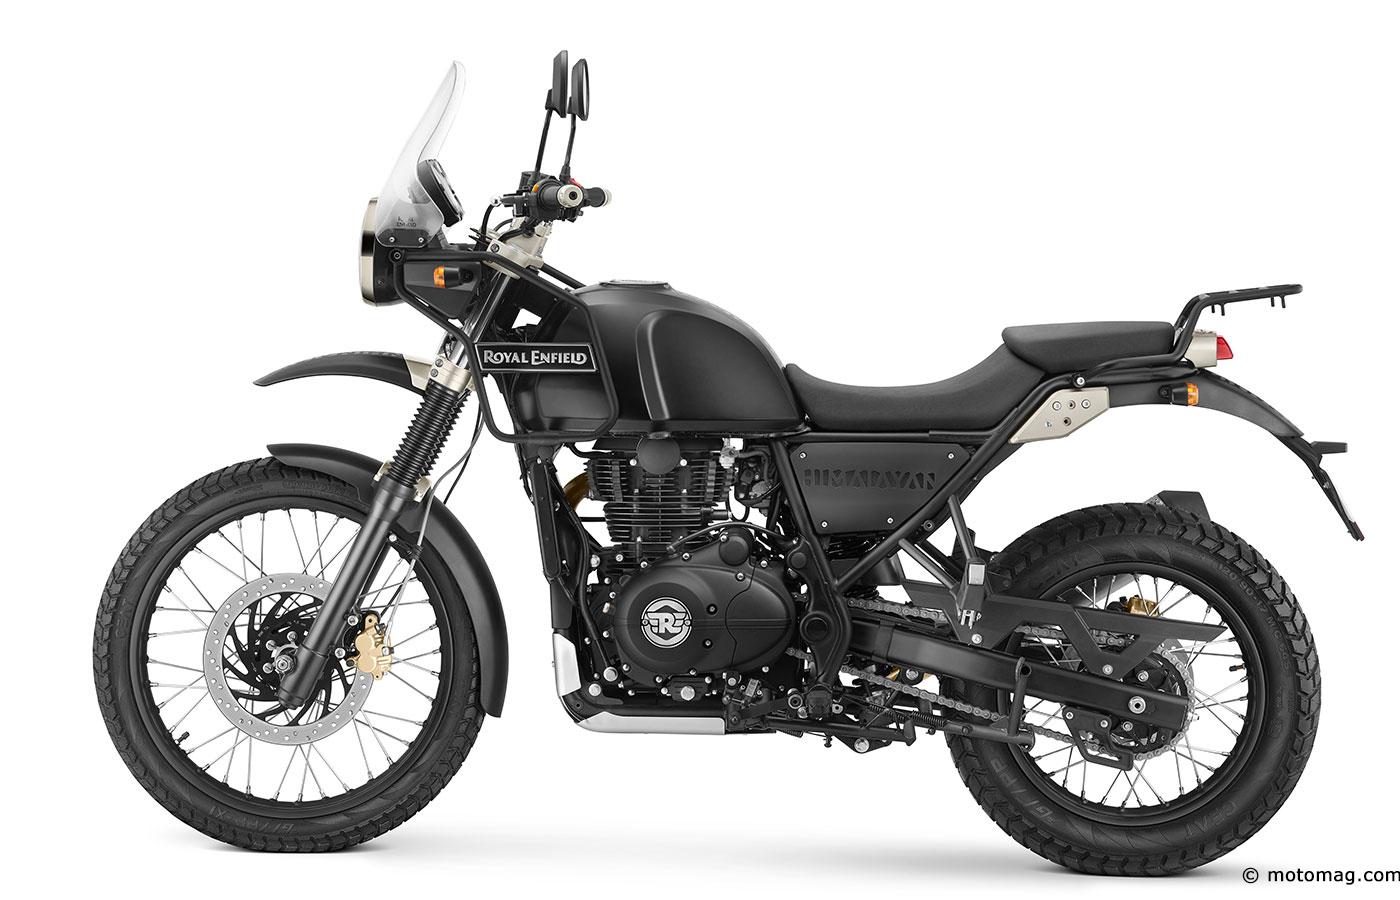 forum motomag sujet nouveaut moto 2016 royal enfield d voile. Black Bedroom Furniture Sets. Home Design Ideas